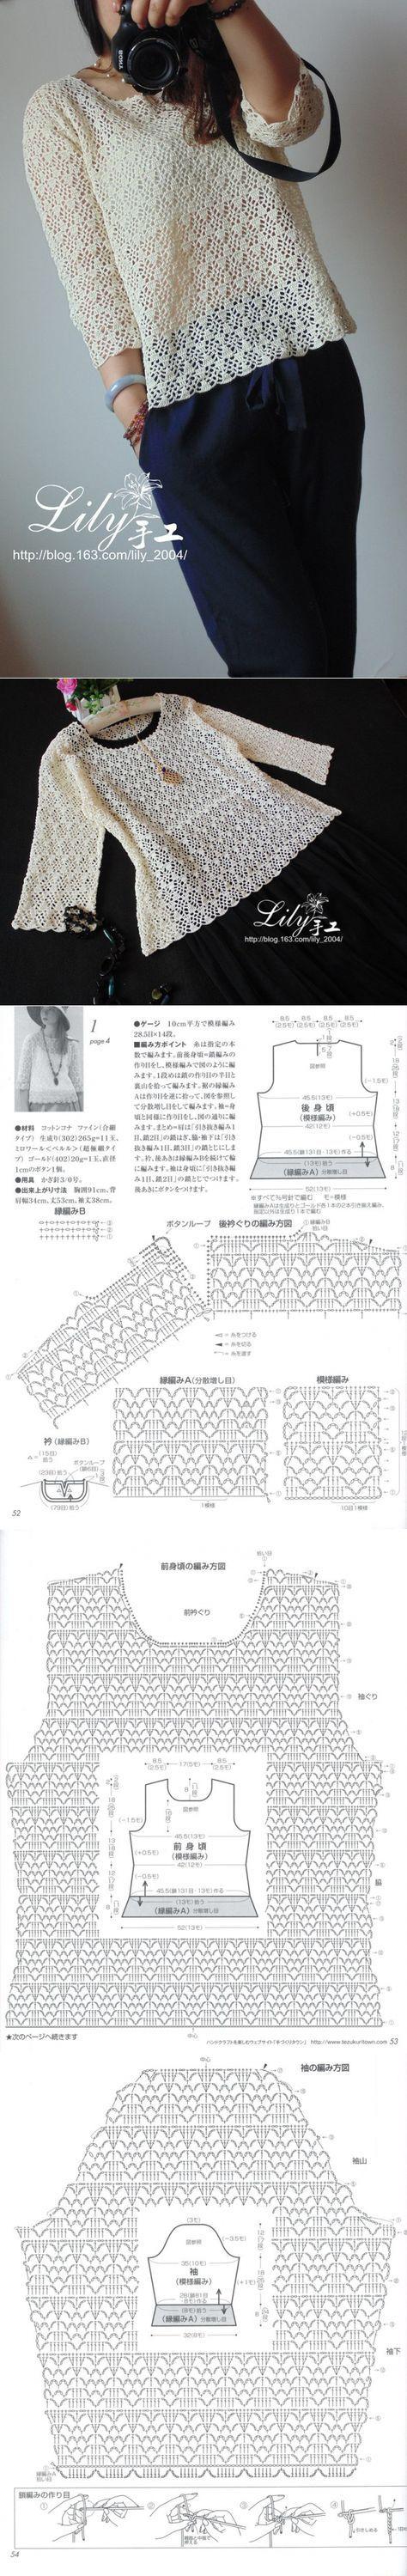 Camisola crochet